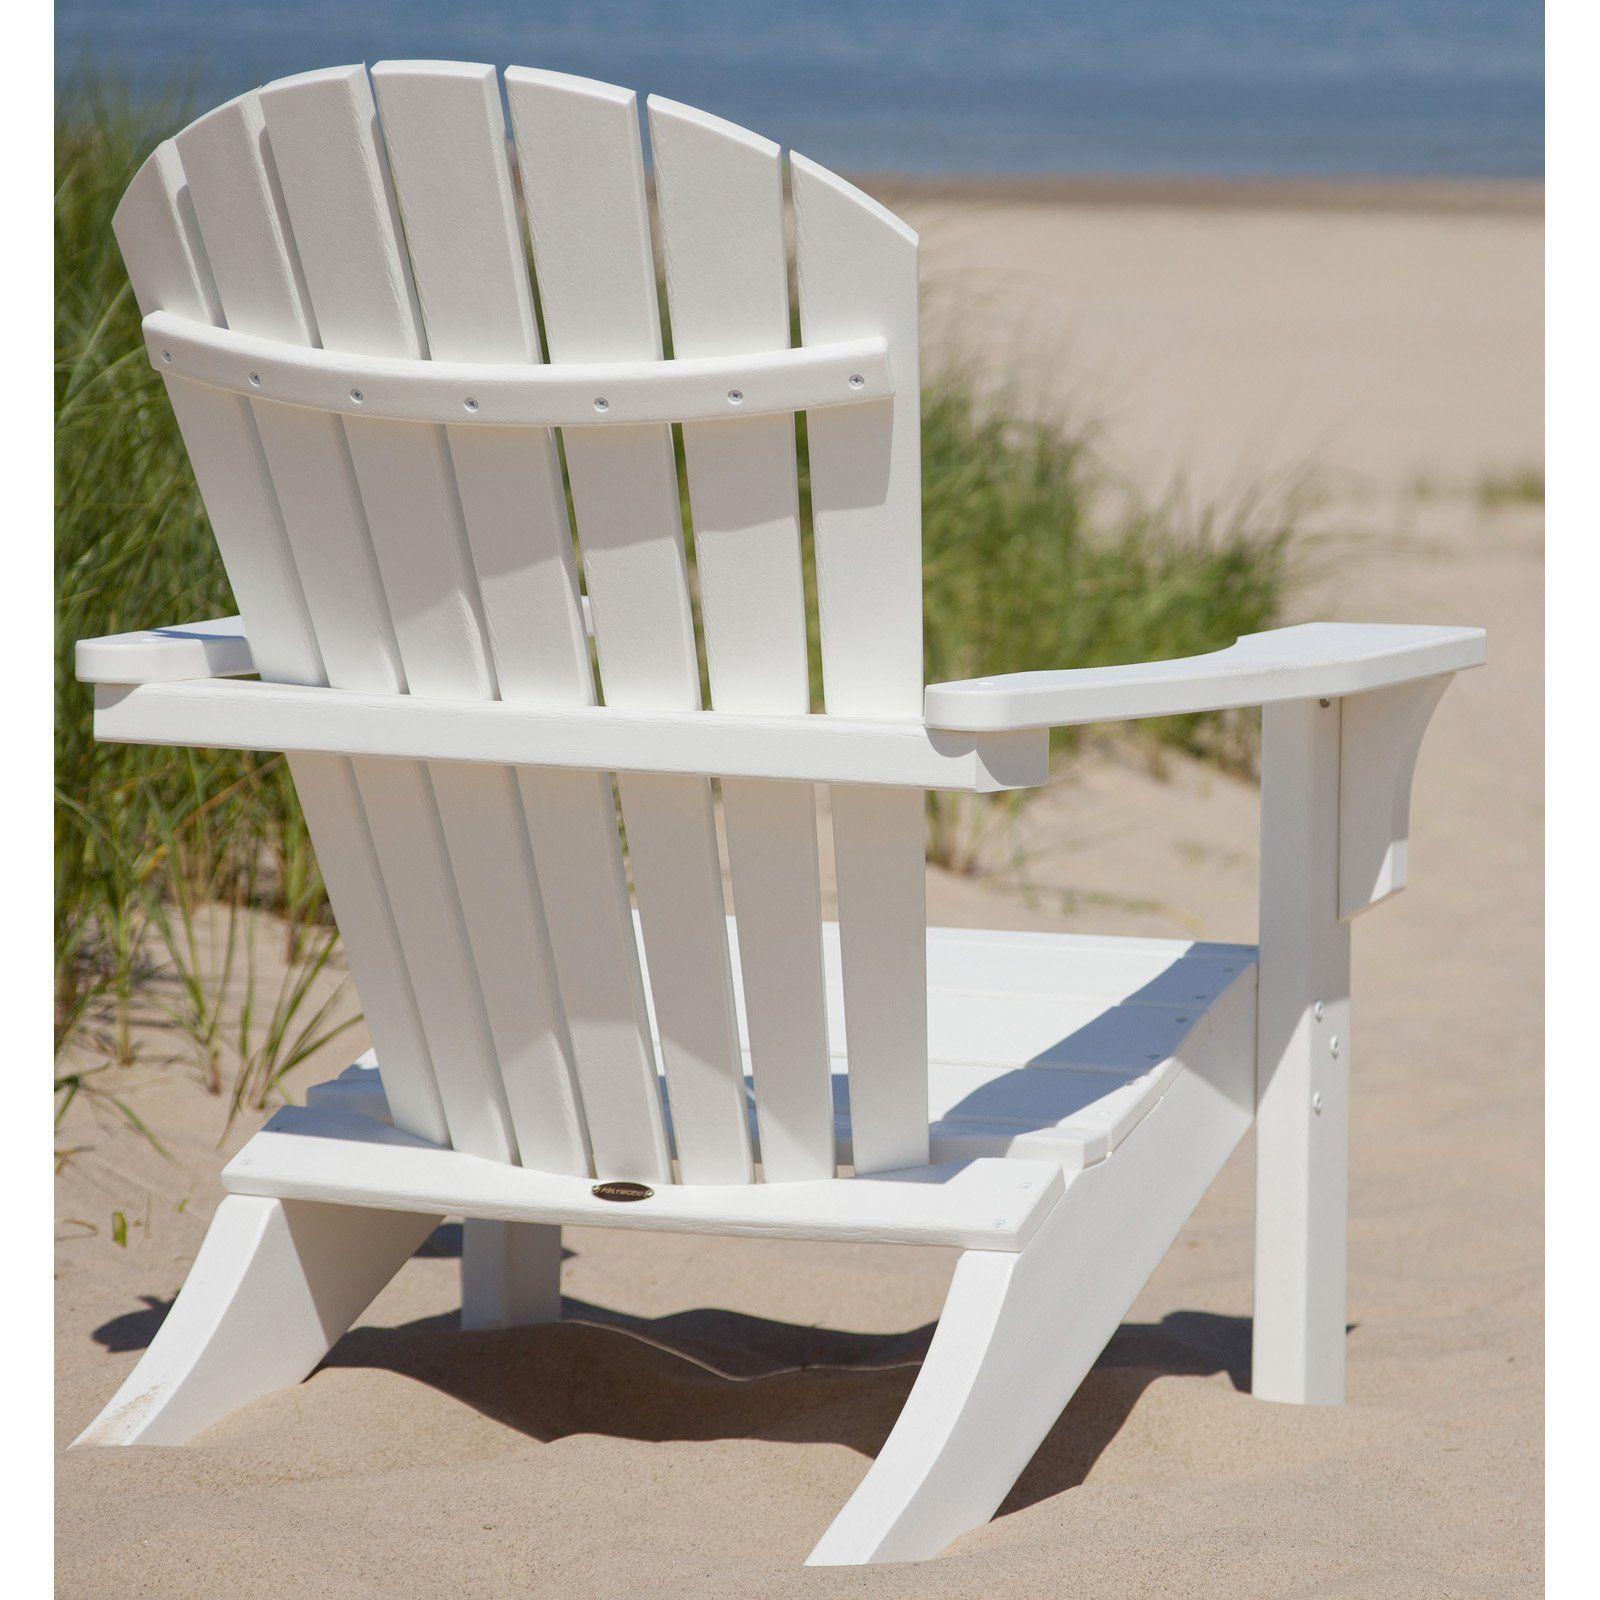 Outdoor POLYWOOD® Seashell Recycled Plastic Adirondack